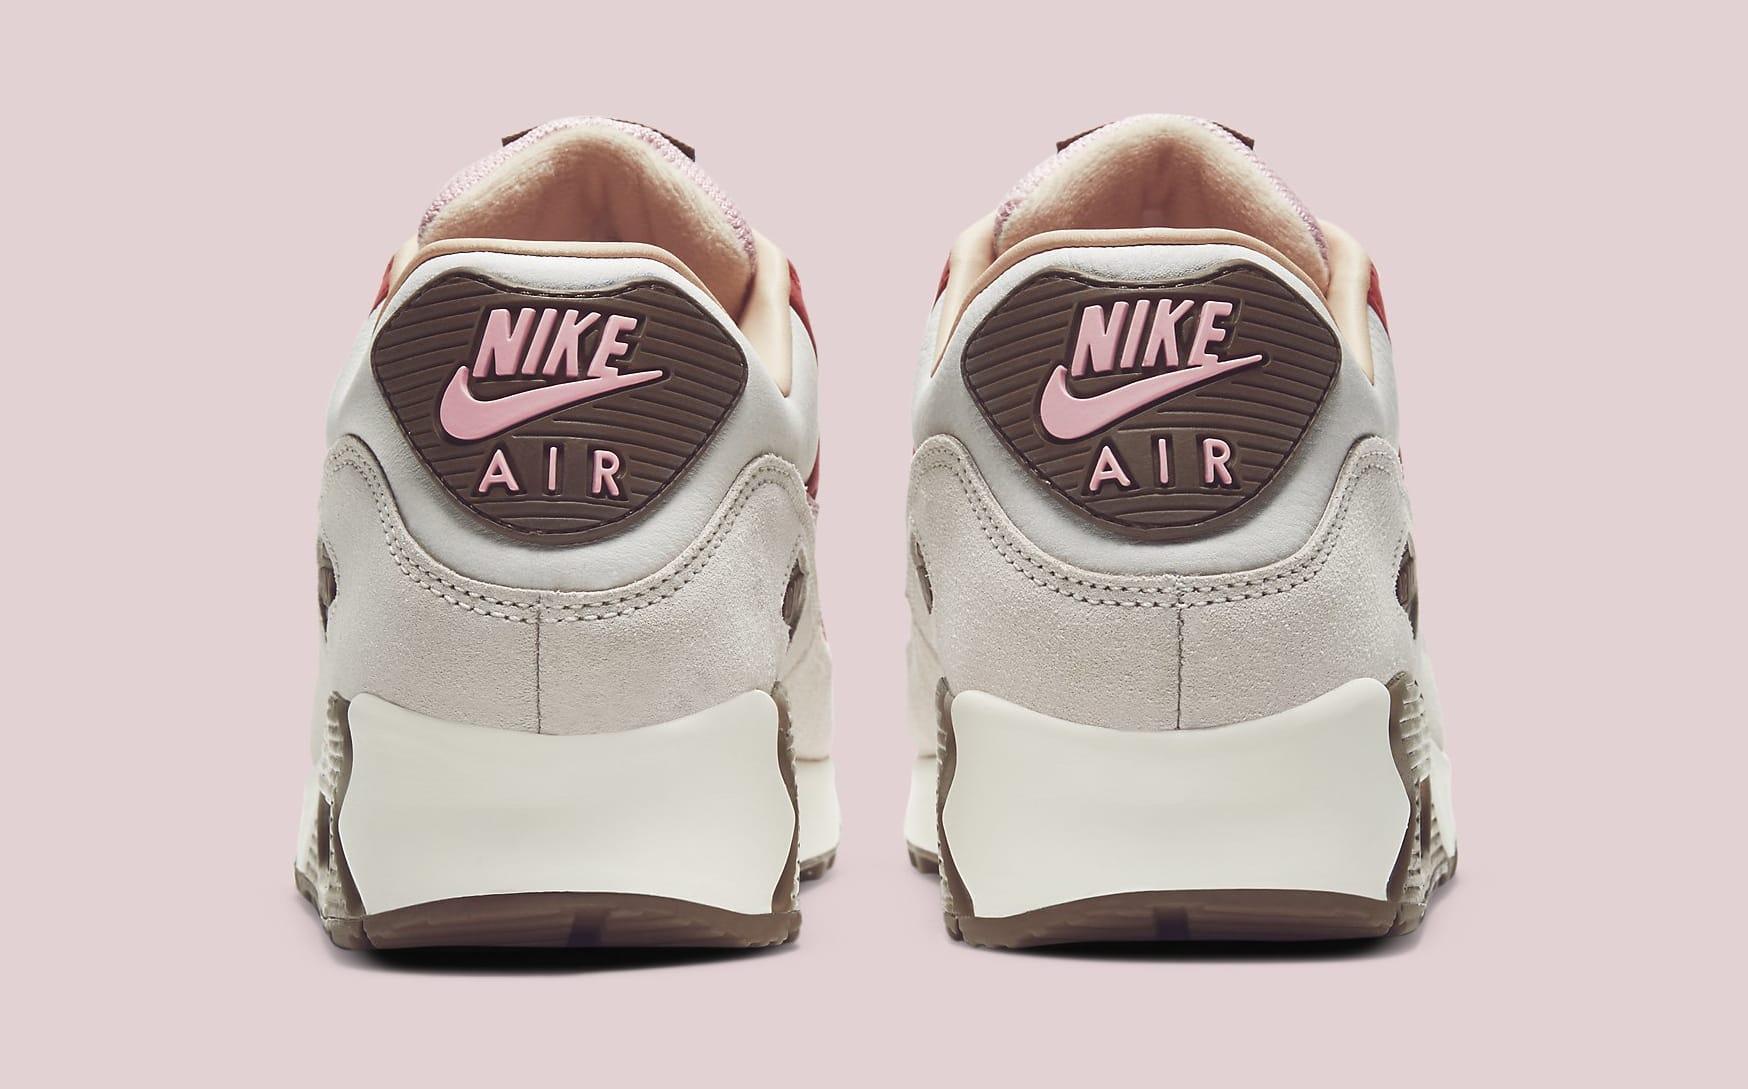 Nike Air Max 90 'Bacon' CU1816-100 Heel